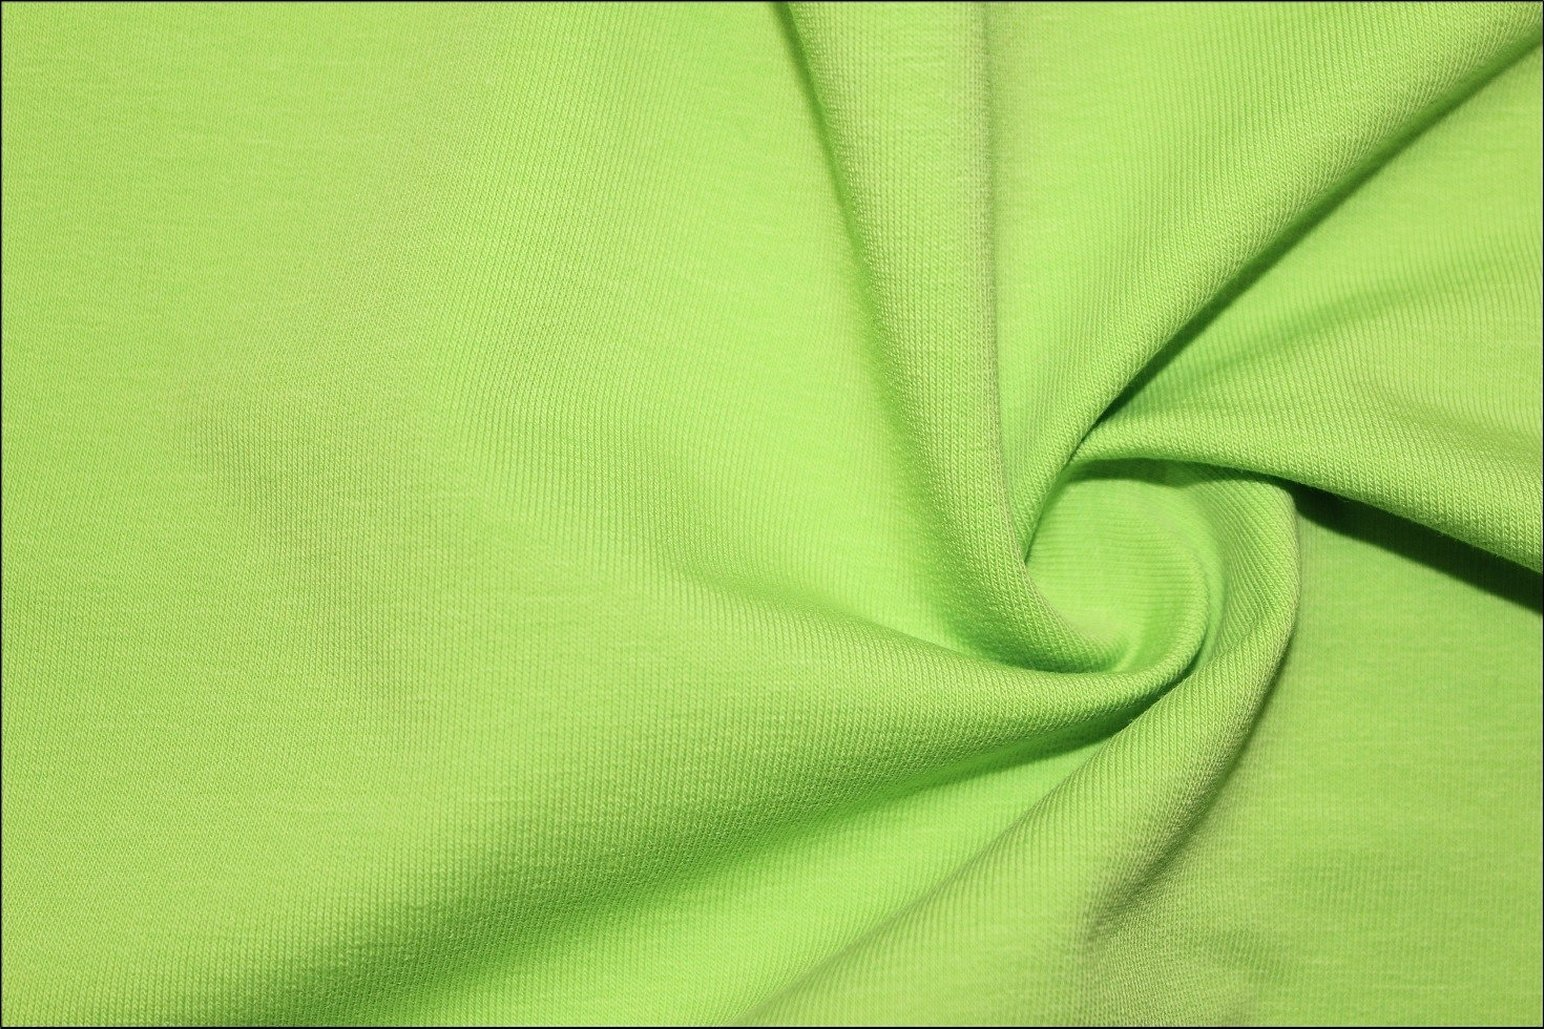 Ткань зеленый хлопок трикотаж